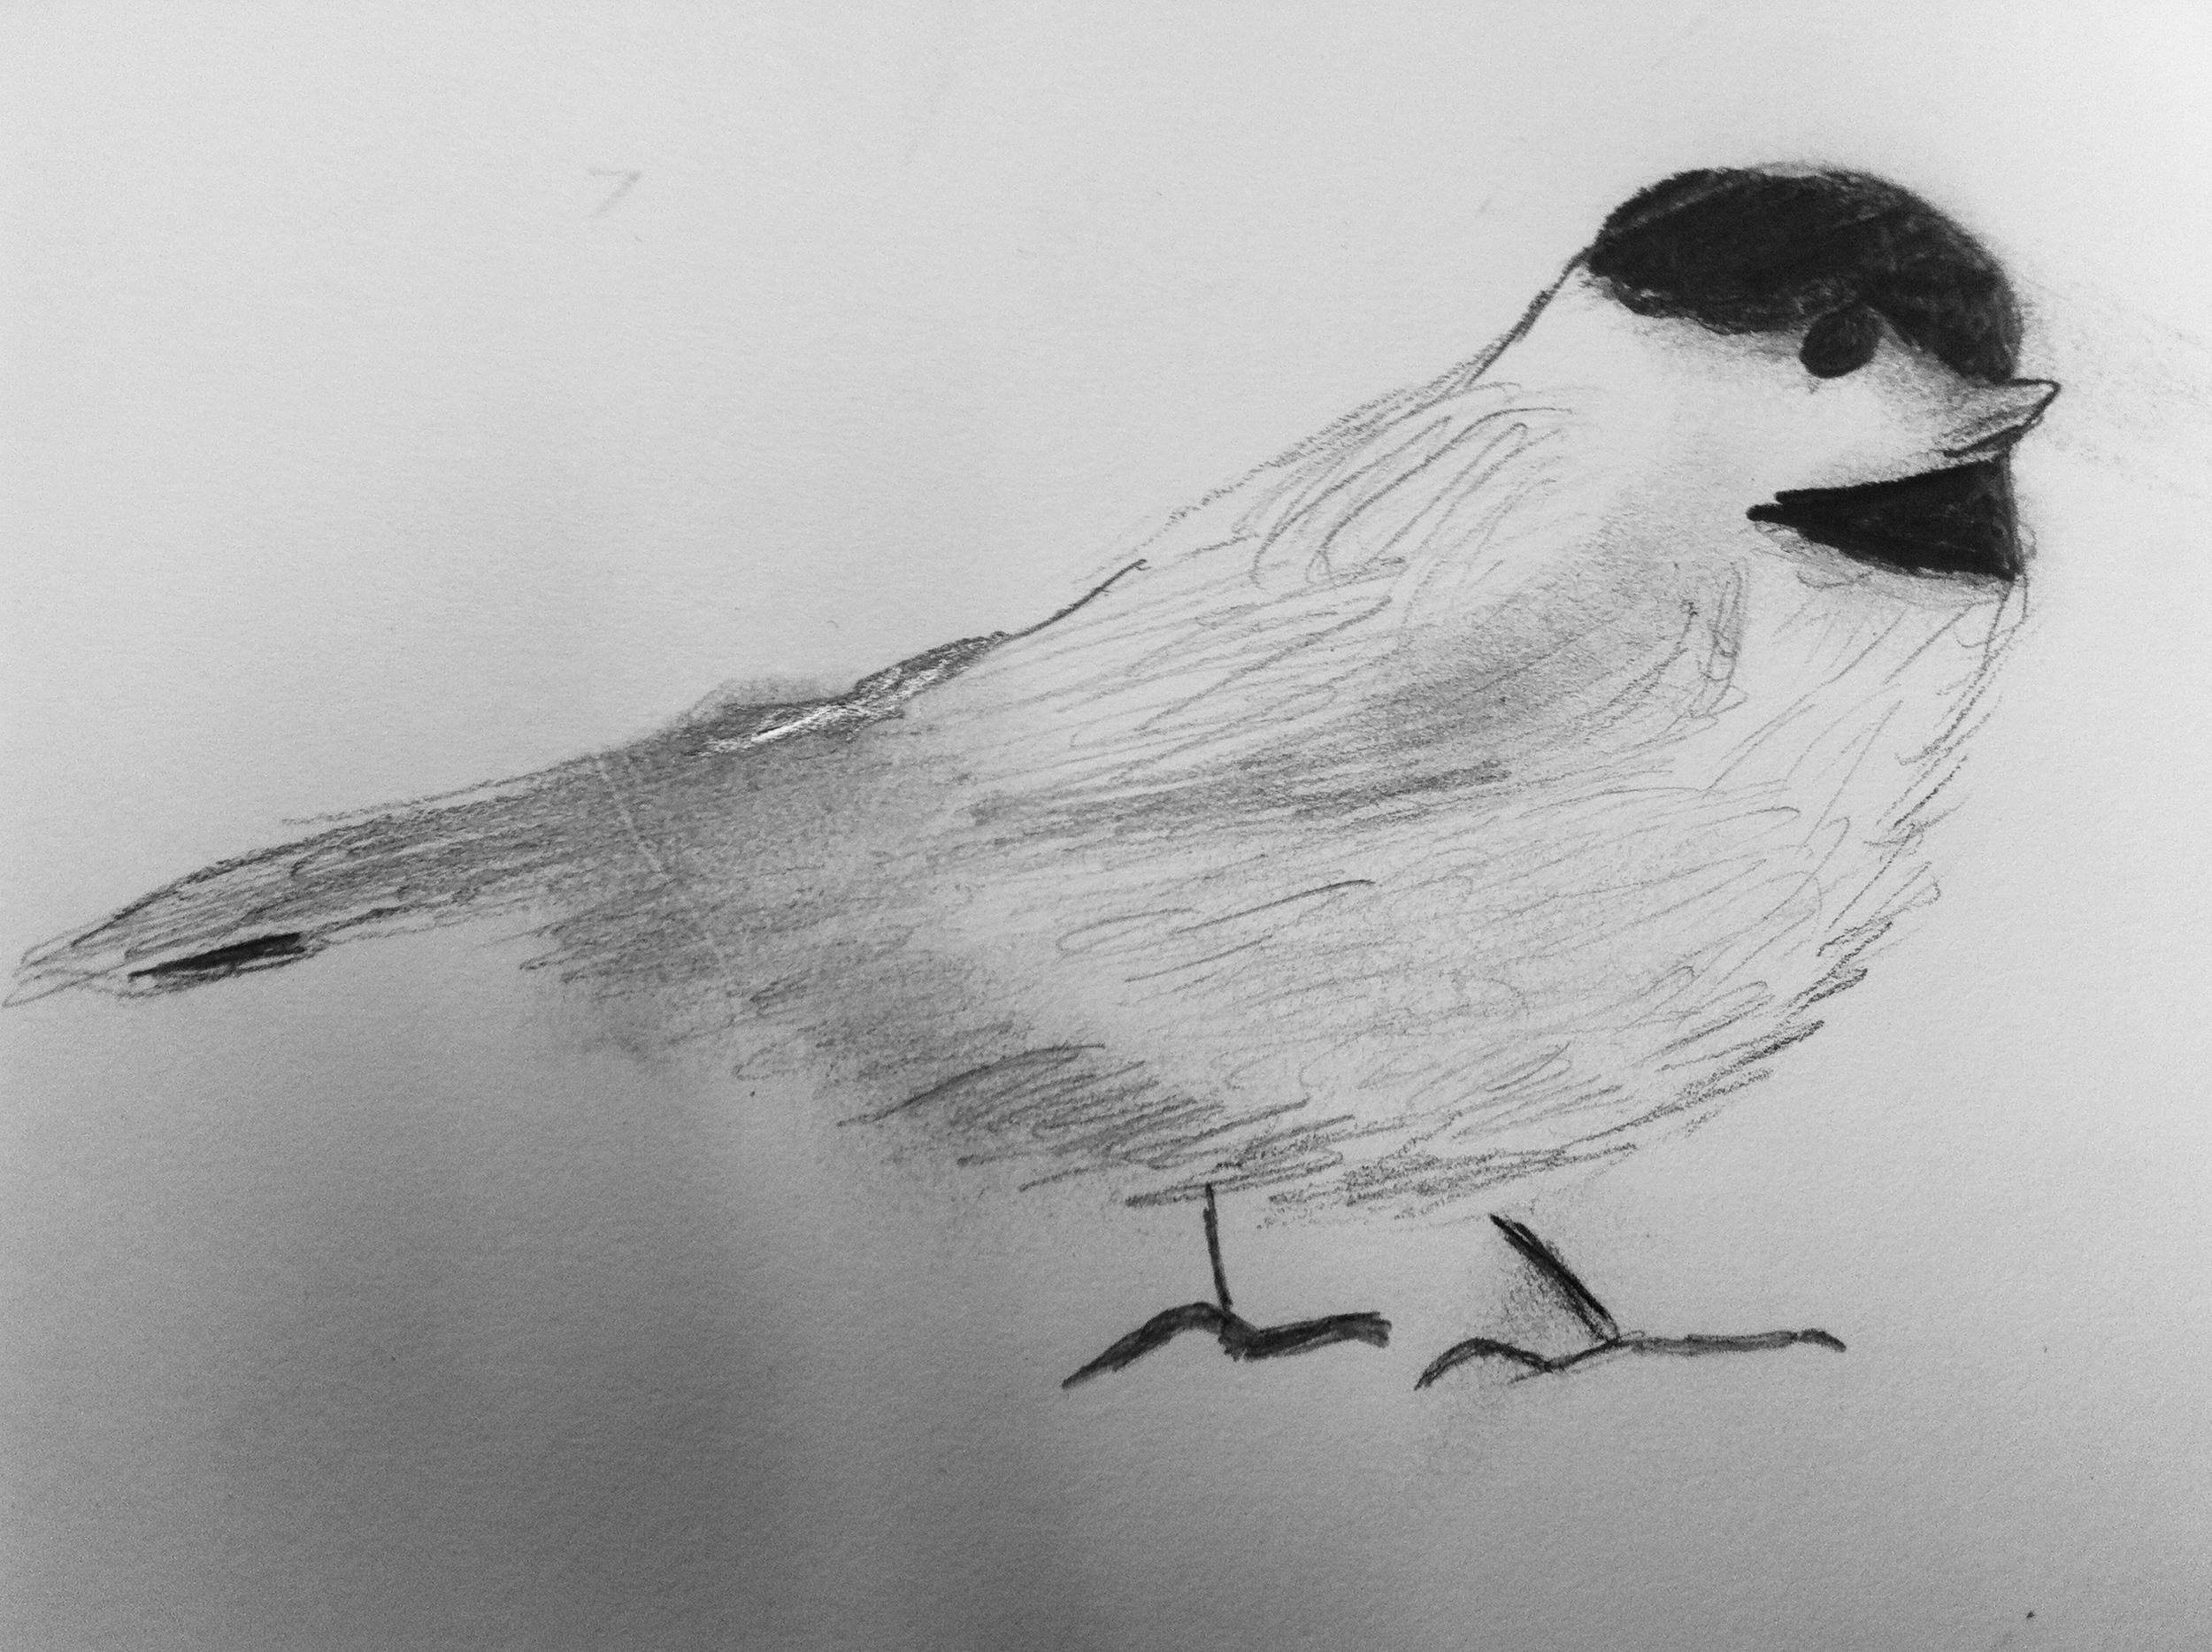 King's sketch of the Carolina chickadee.